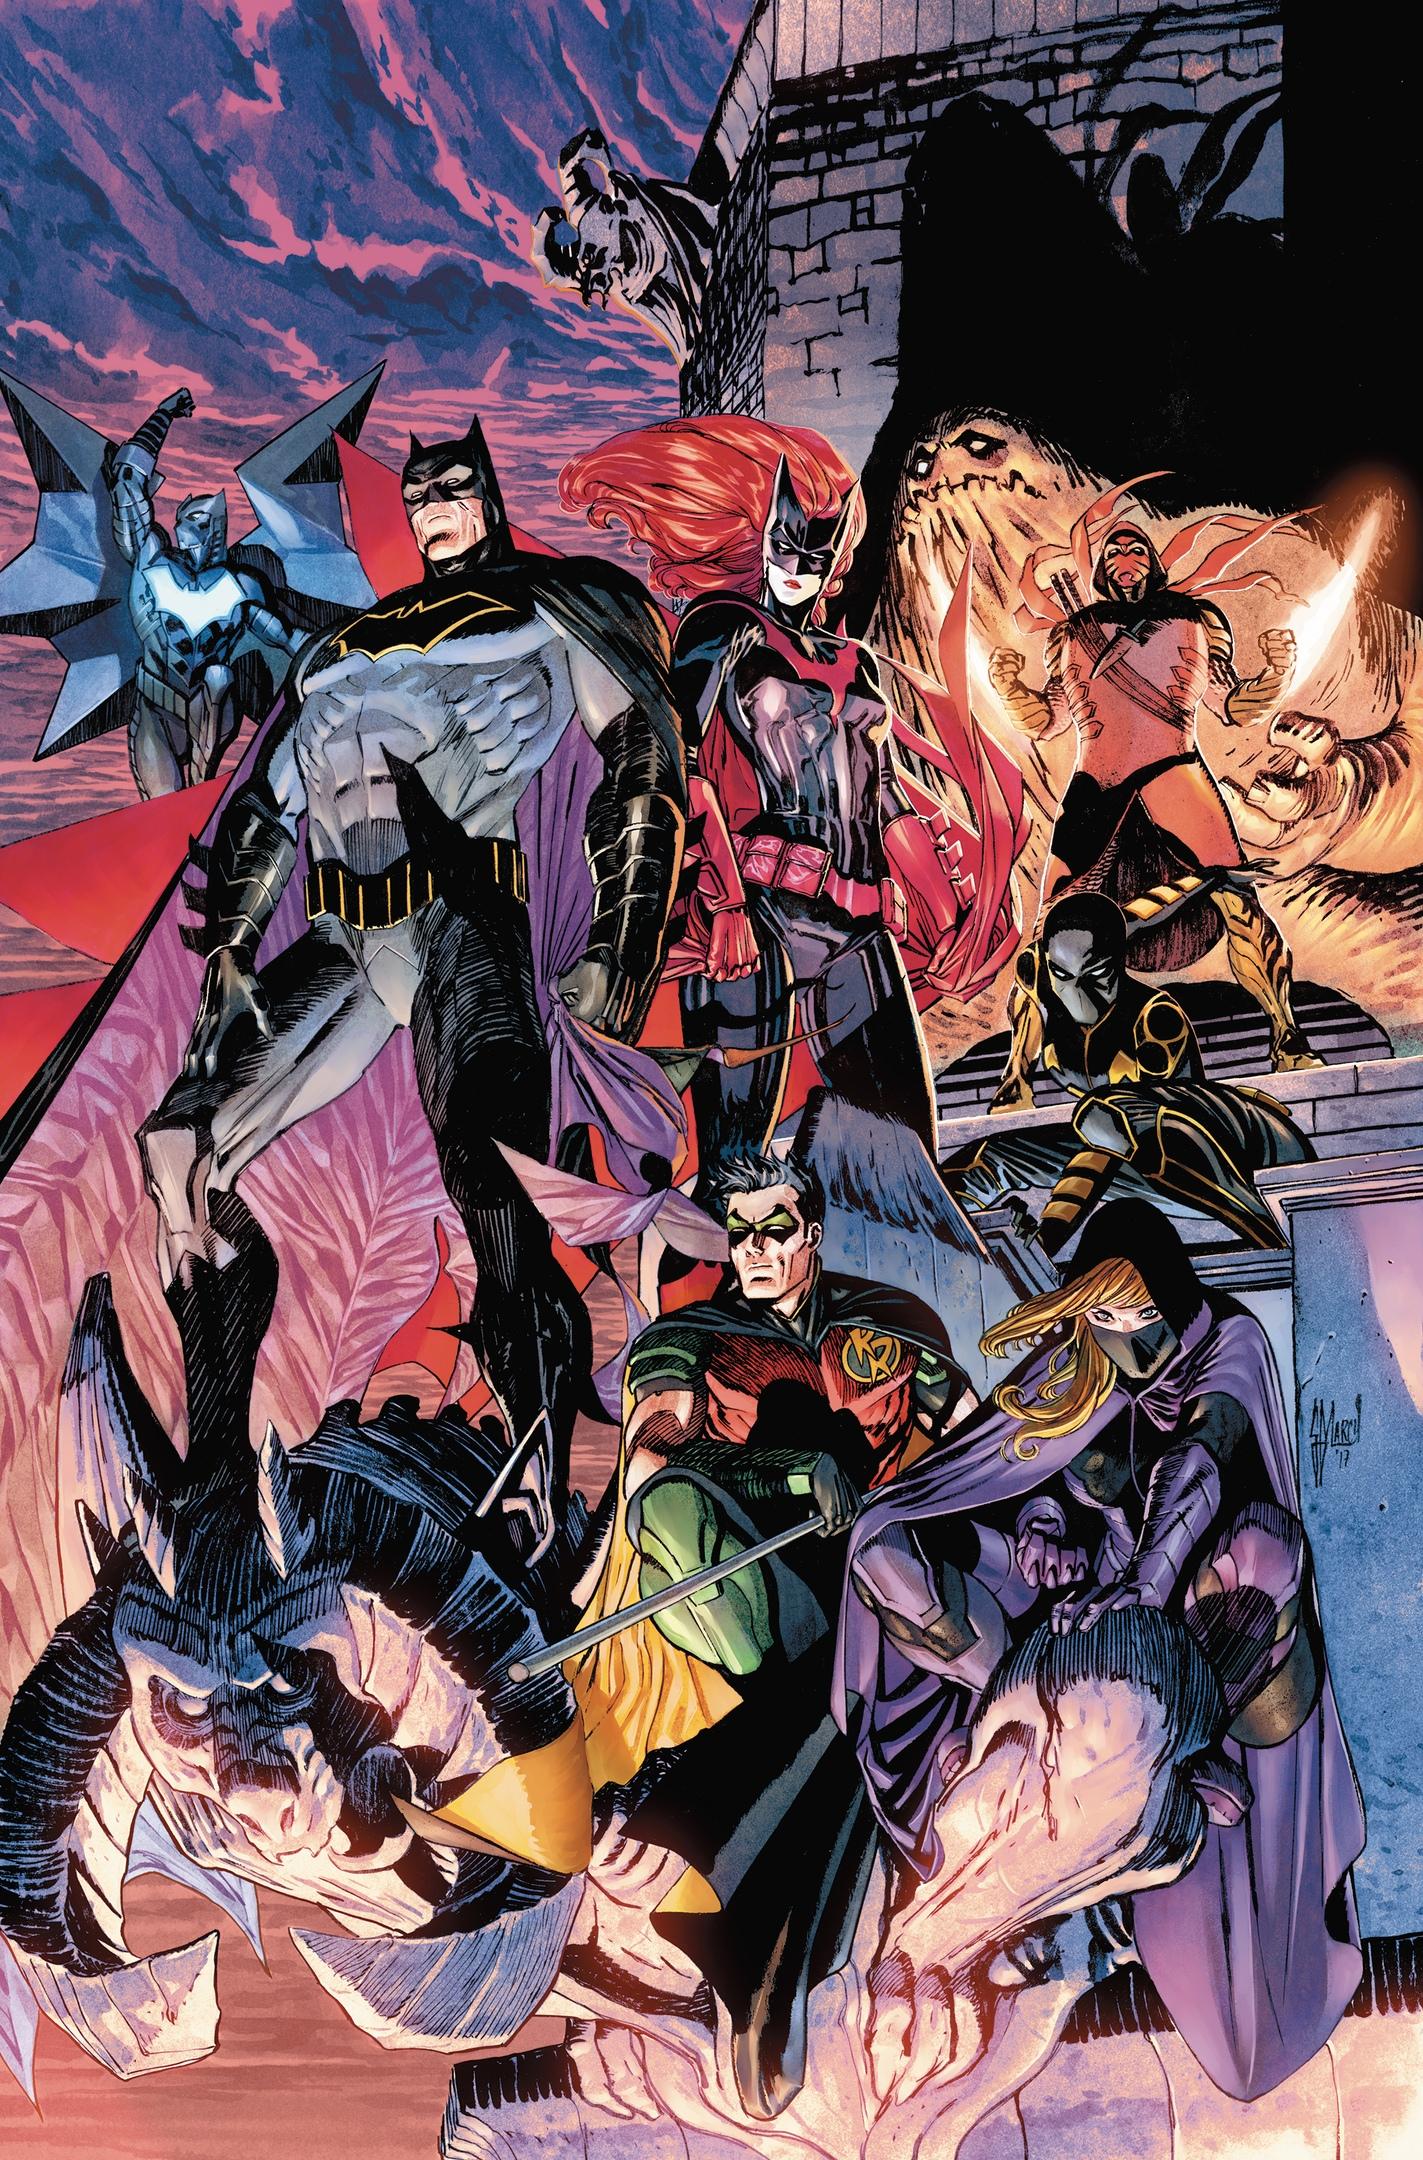 Detective Comics Vol 1 969 Textless Cover.jpg